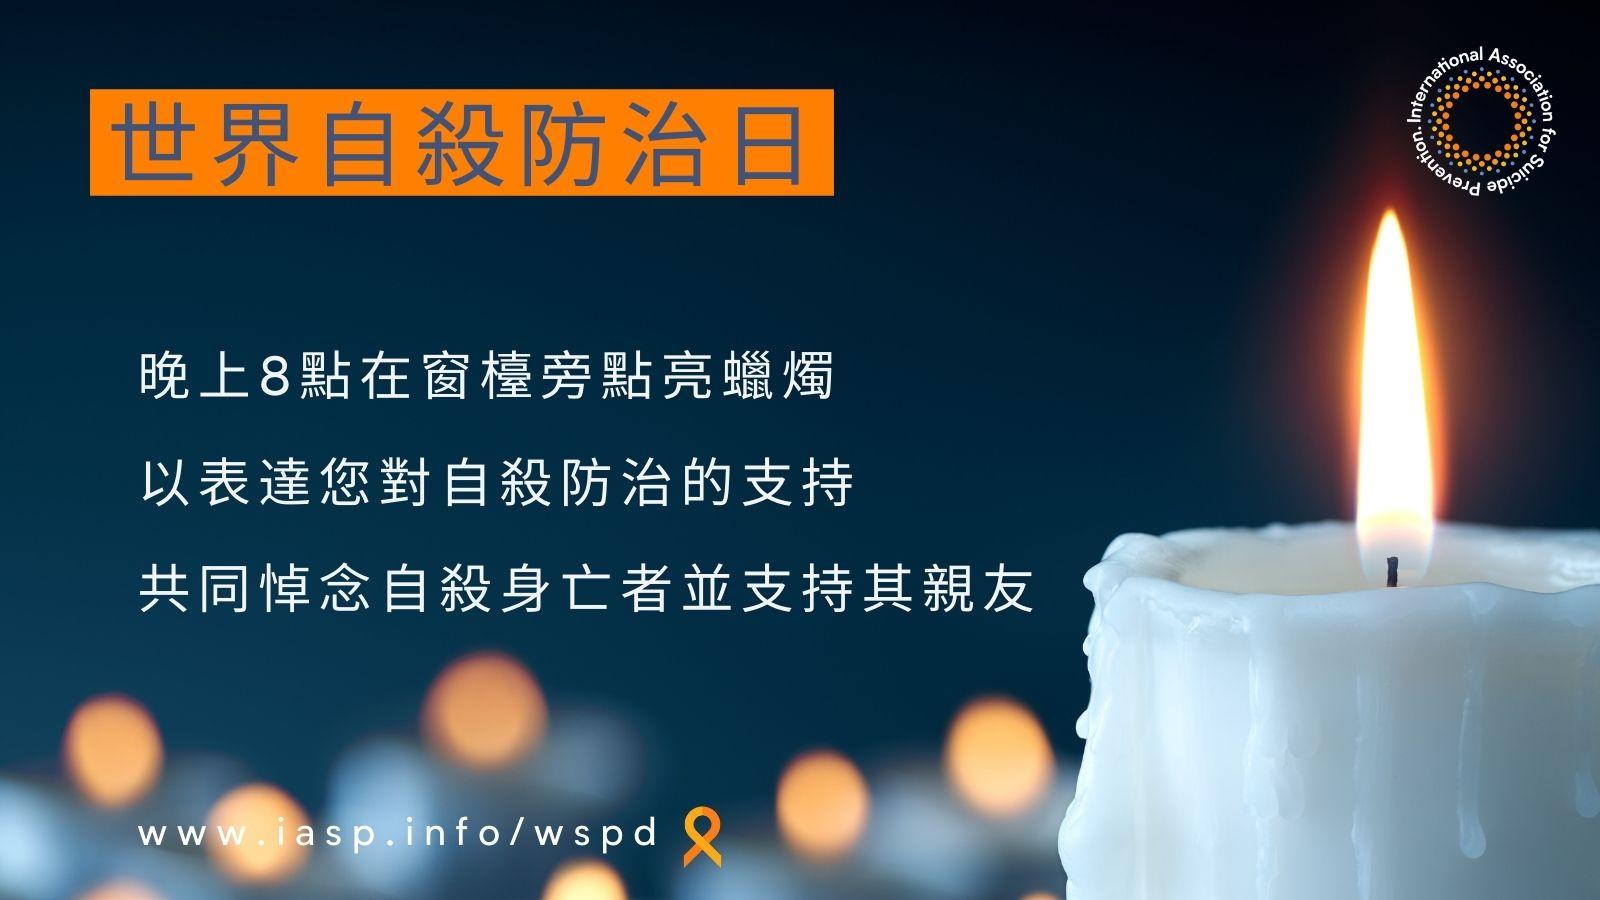 Chinese Taiwan